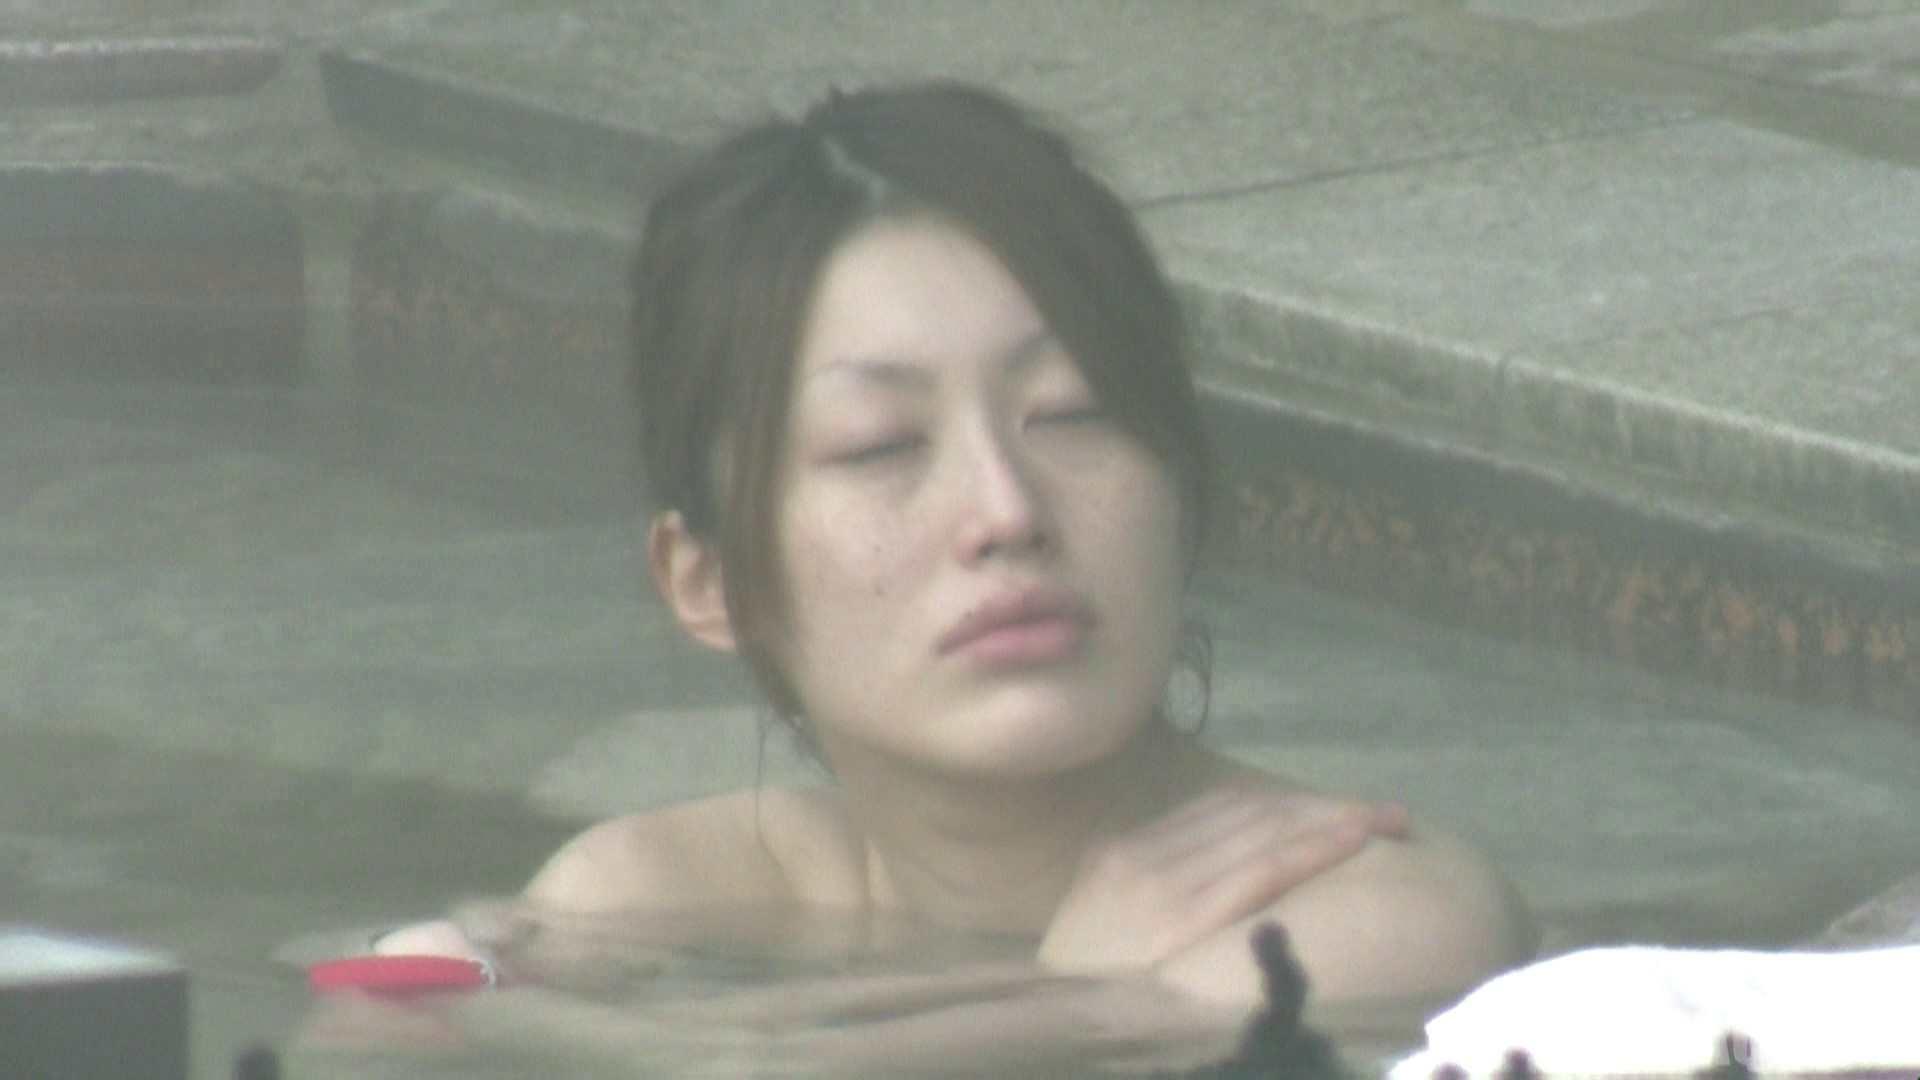 Aquaな露天風呂Vol.775 露天風呂編  78PIX 26